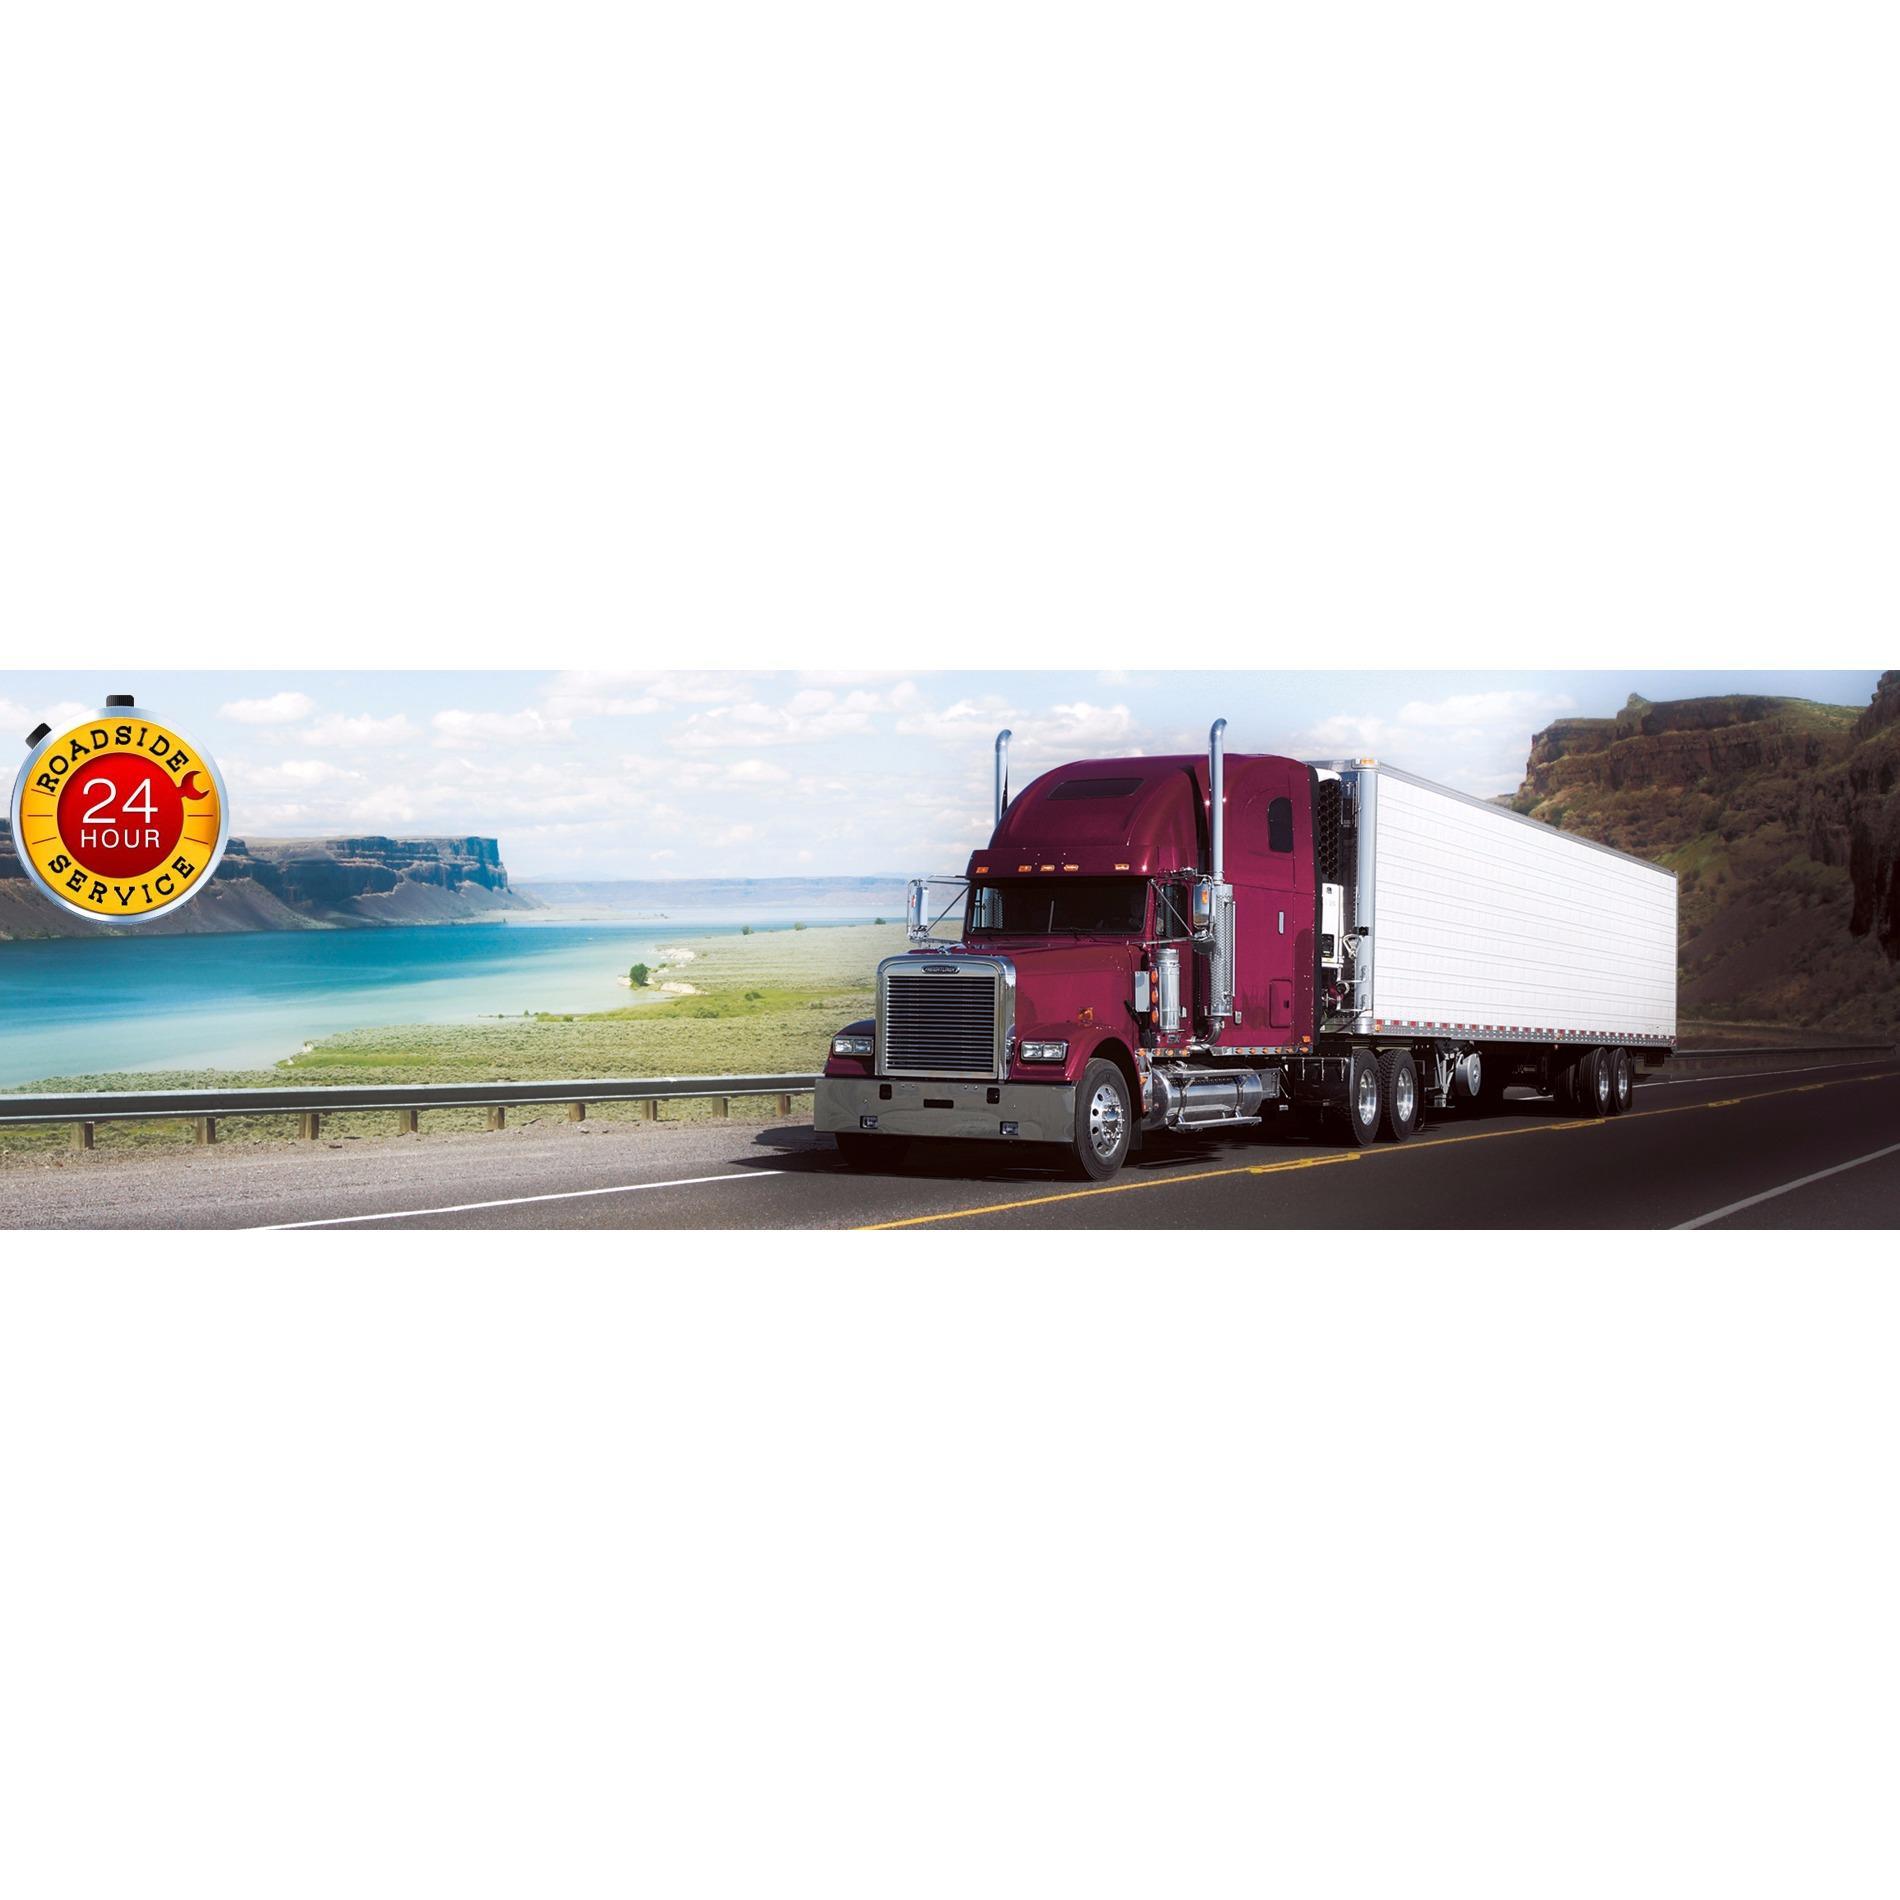 Express Truck Repair